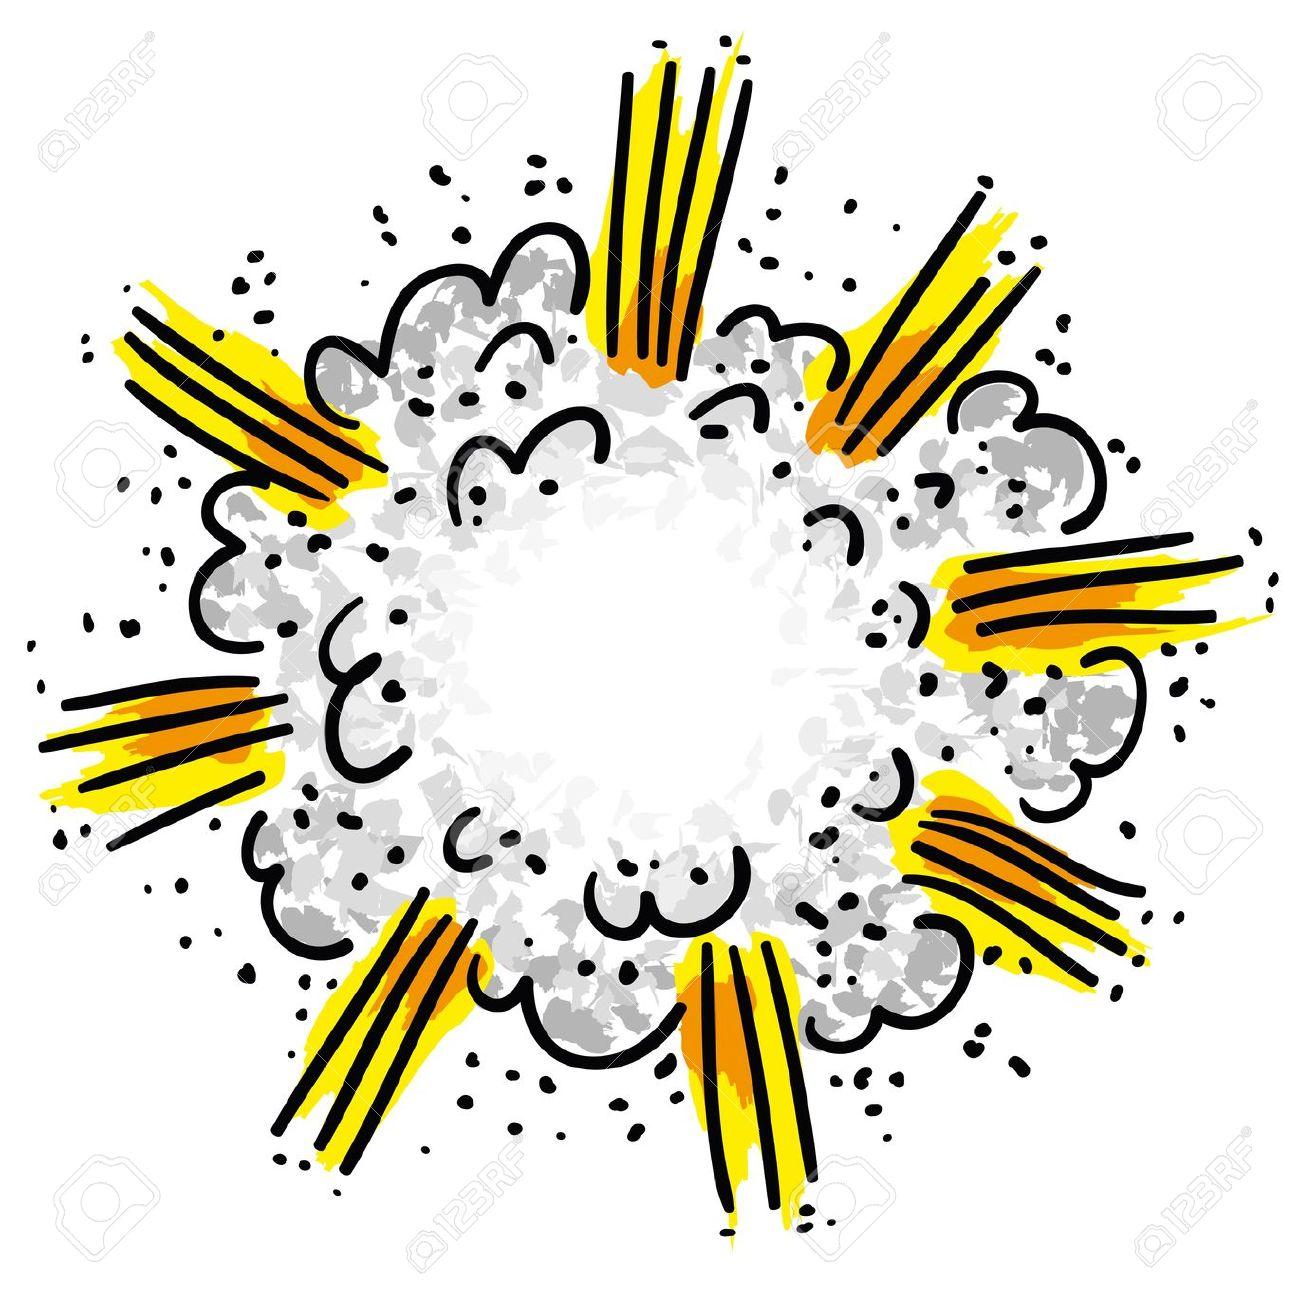 Image of blast clipart 0 explosion cartoon vector clip art 2.